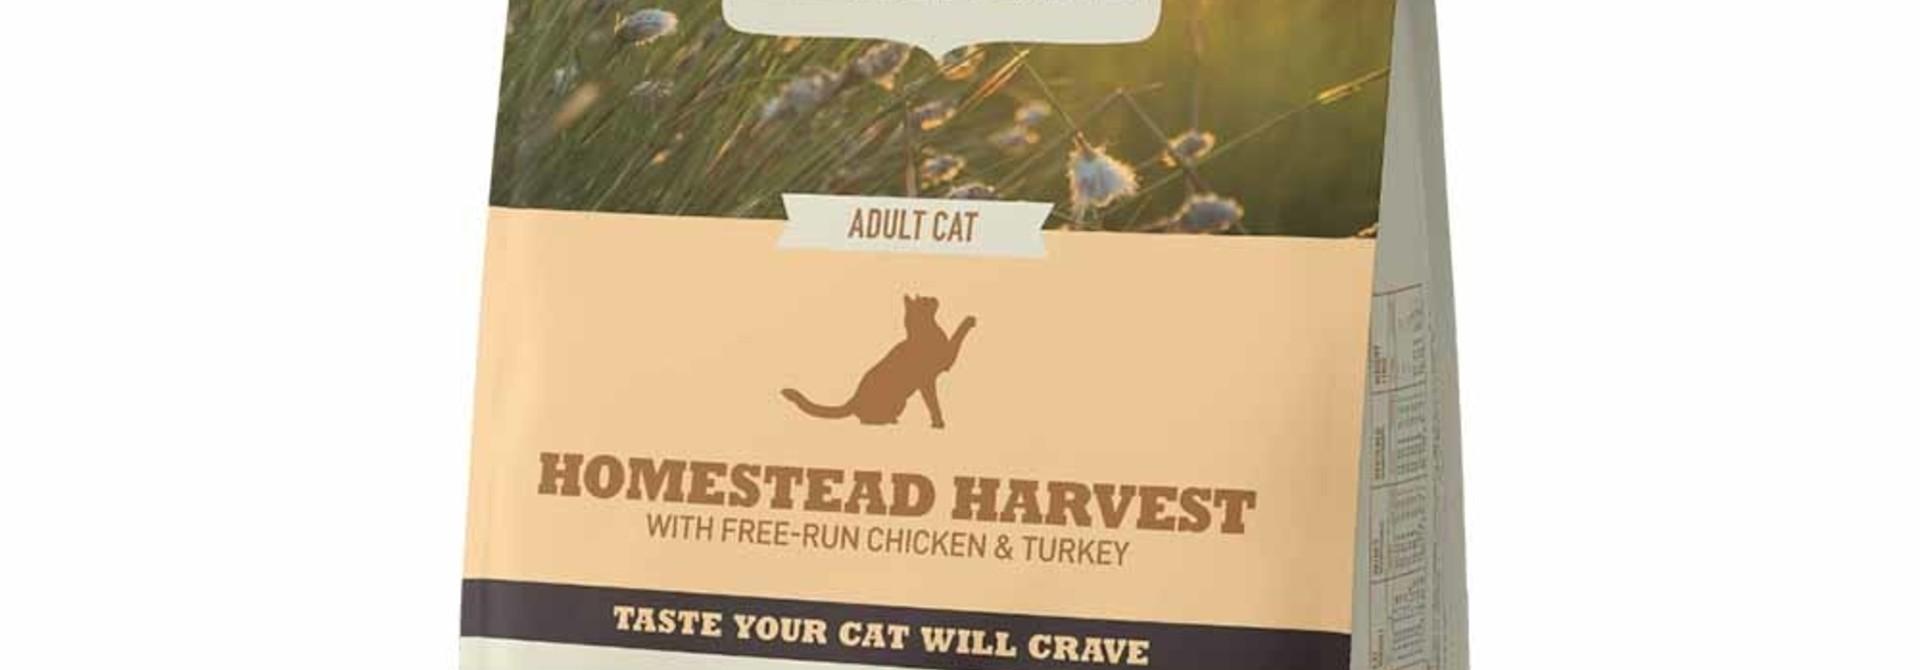 AC Cat Home Harvest 4.5kg